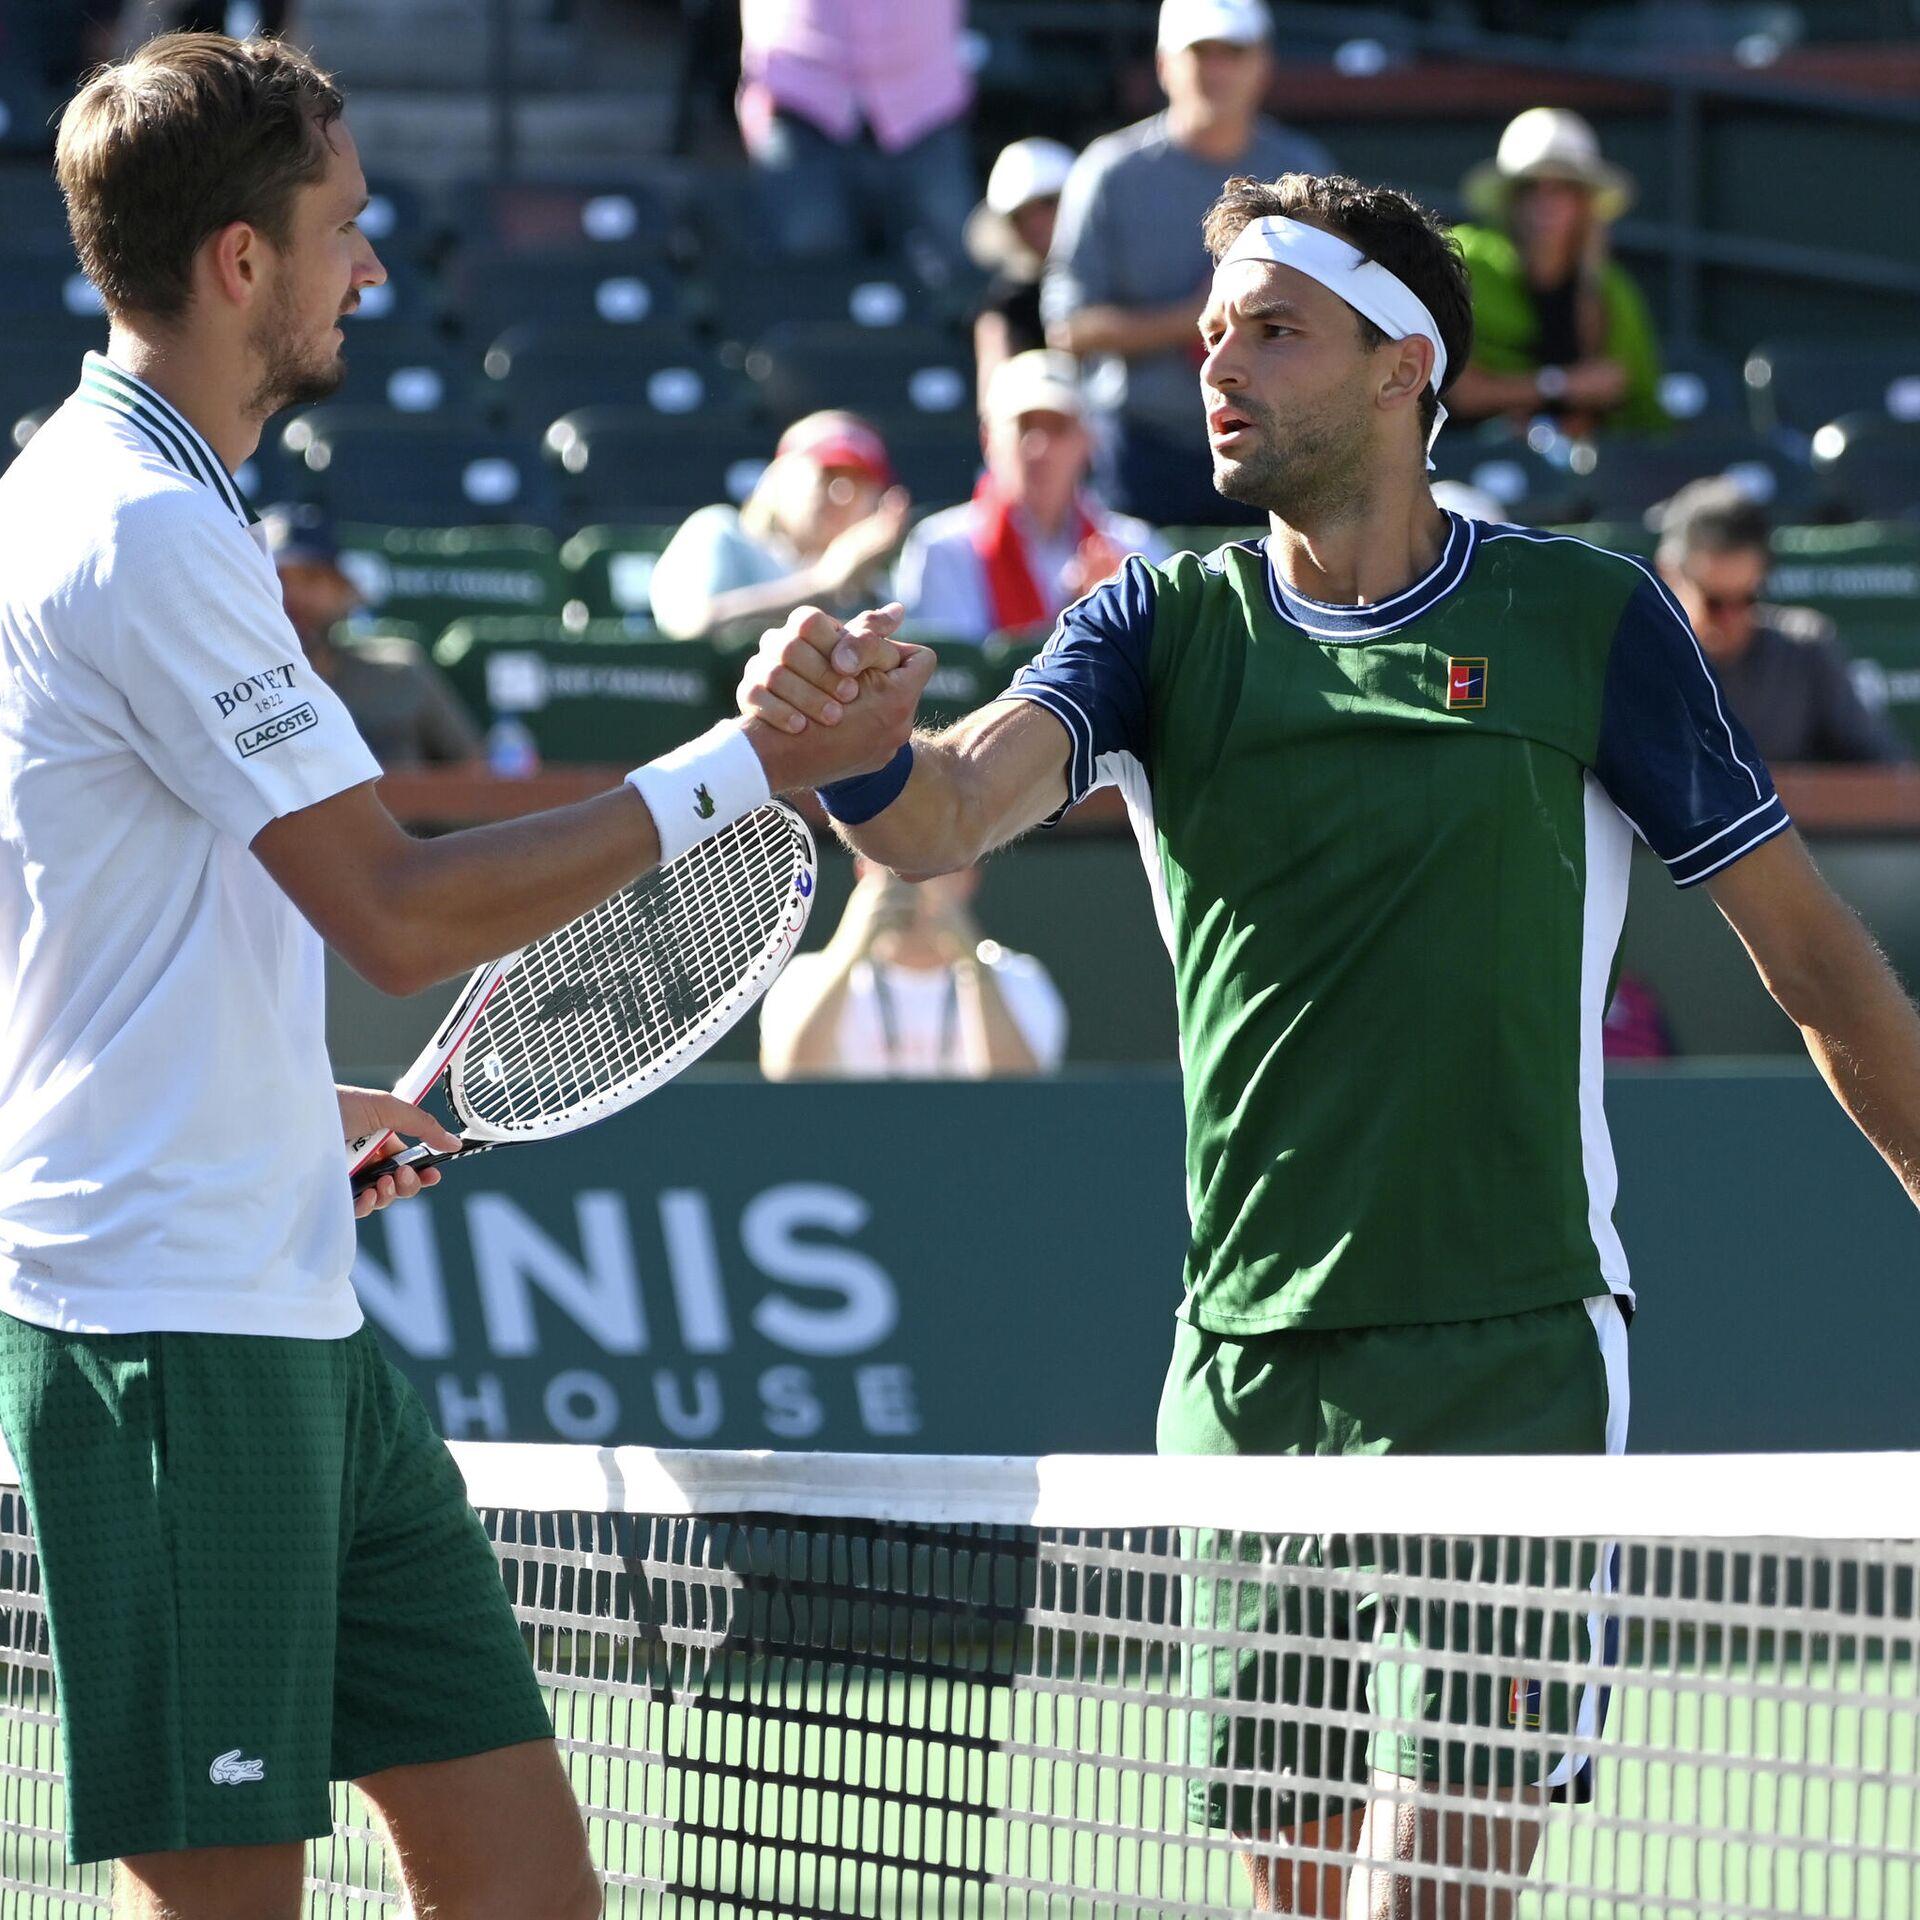 Memes Go Viral as Grigor Dimitrov Shocks US Open Champion Daniil Medvedev  at Indian Wells - 14.10.2021, Sputnik International